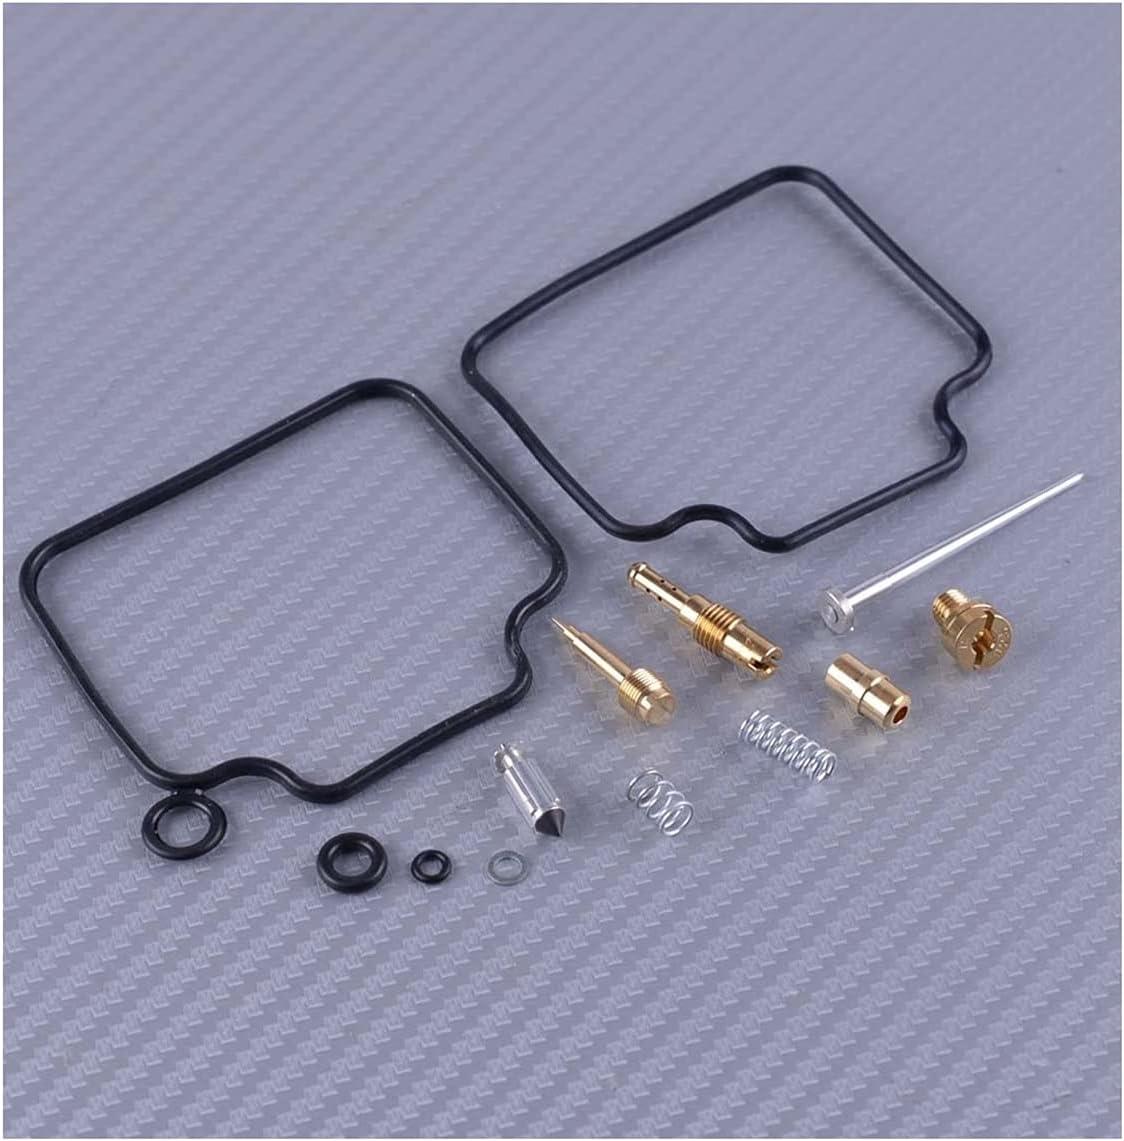 SDLSH Auto Accessories Spasm price Carburetor A Kit Rebuild store